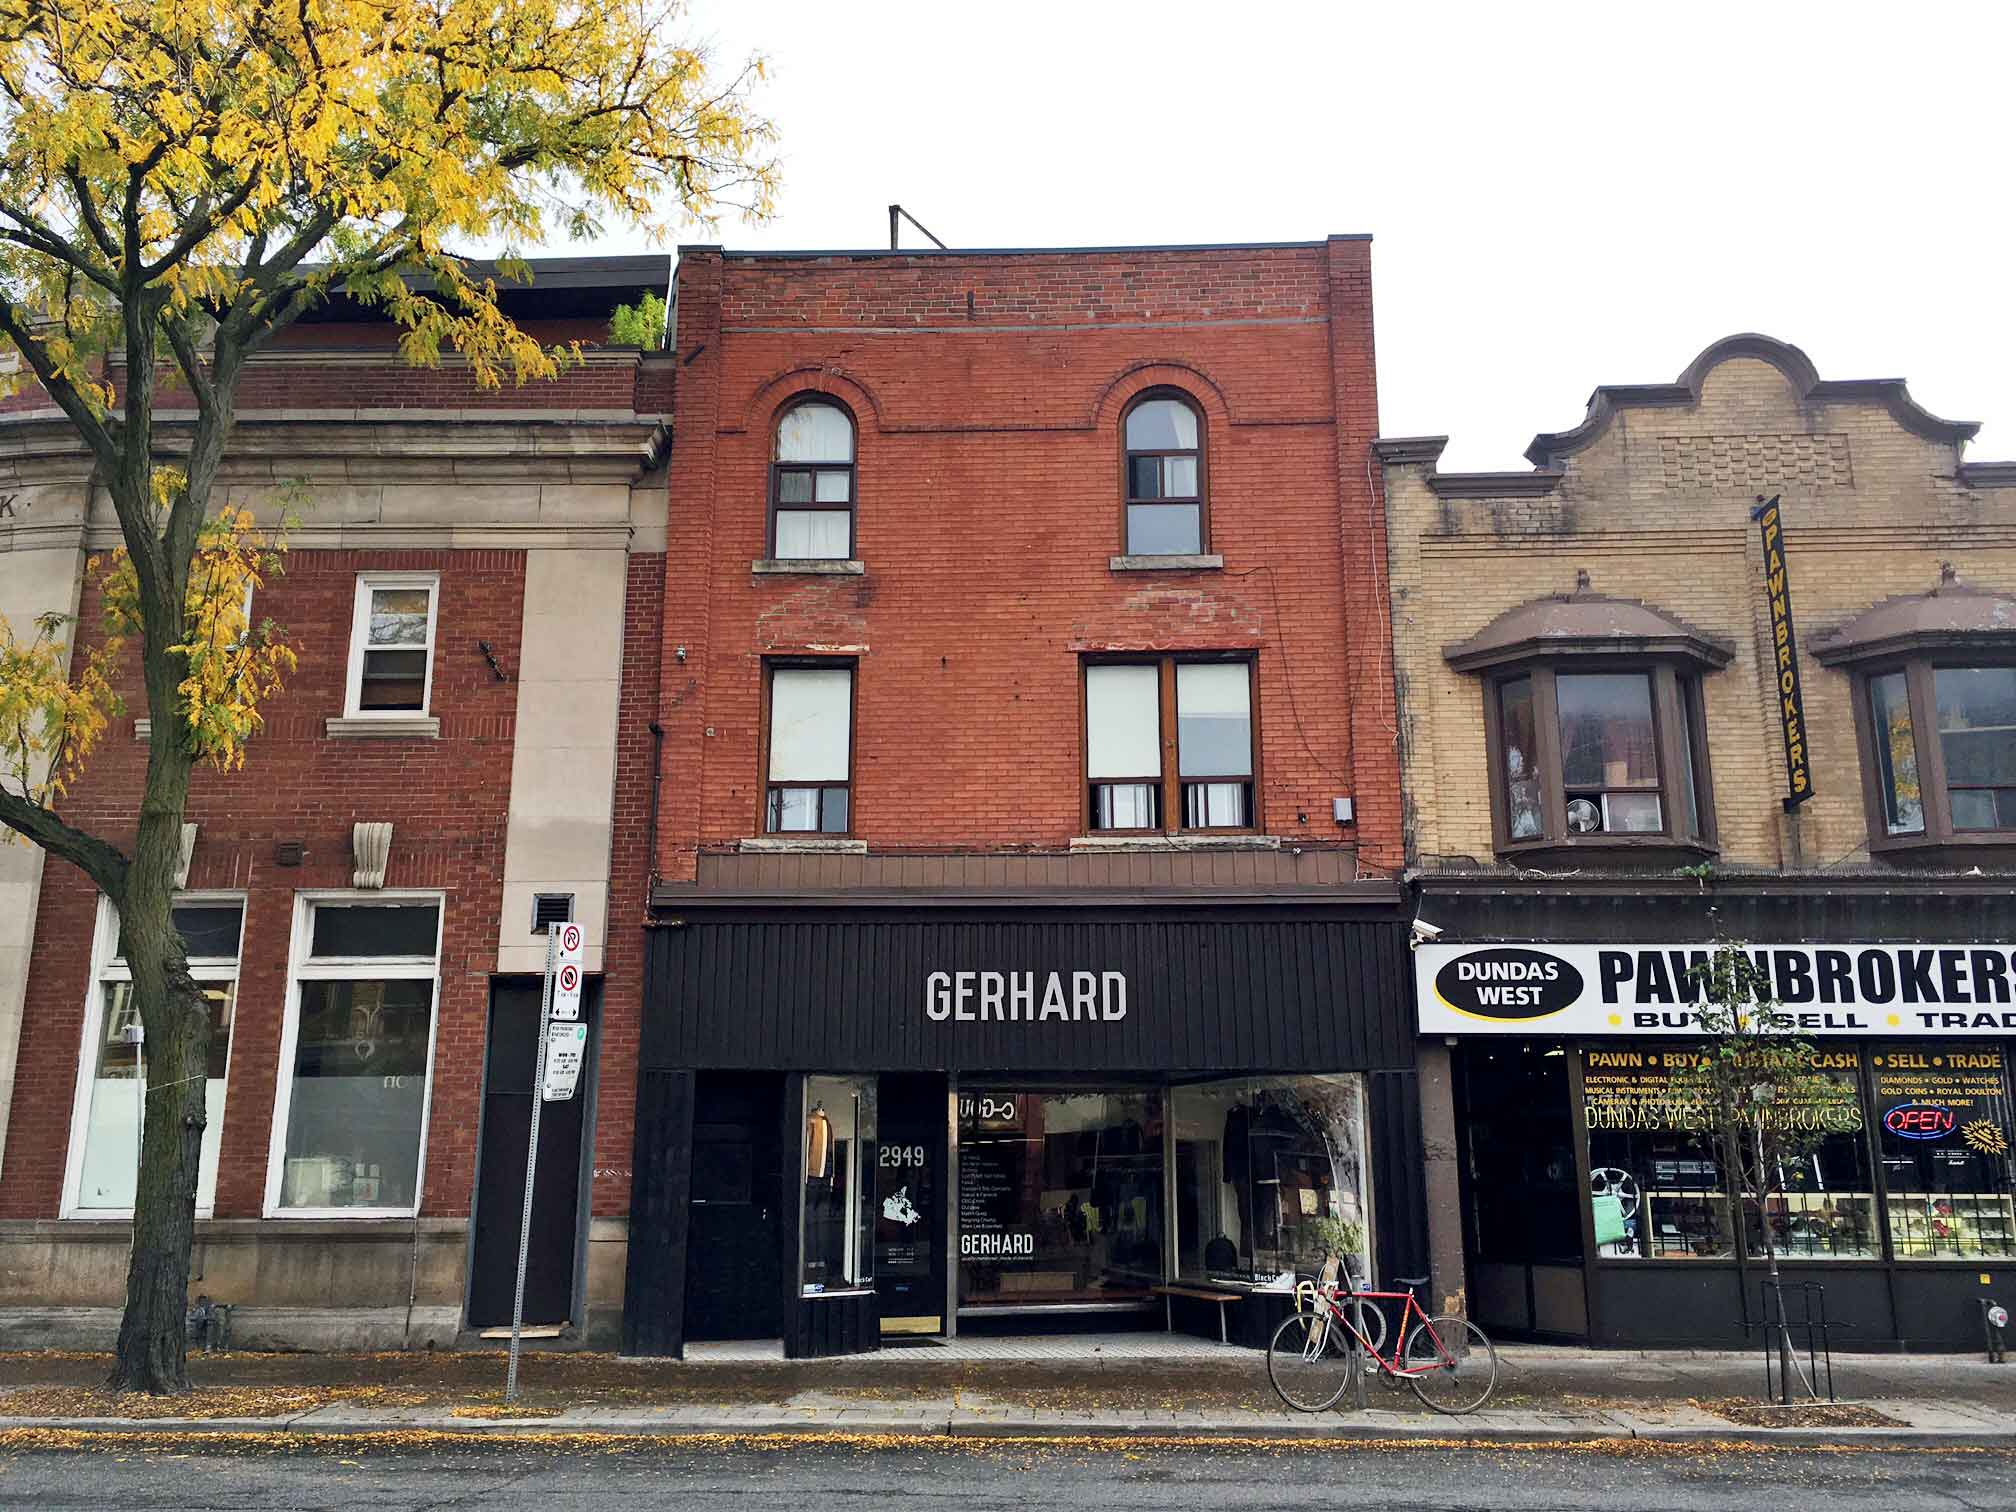 GERHARD - GERHARD is an independent menswear shop in Toronto's